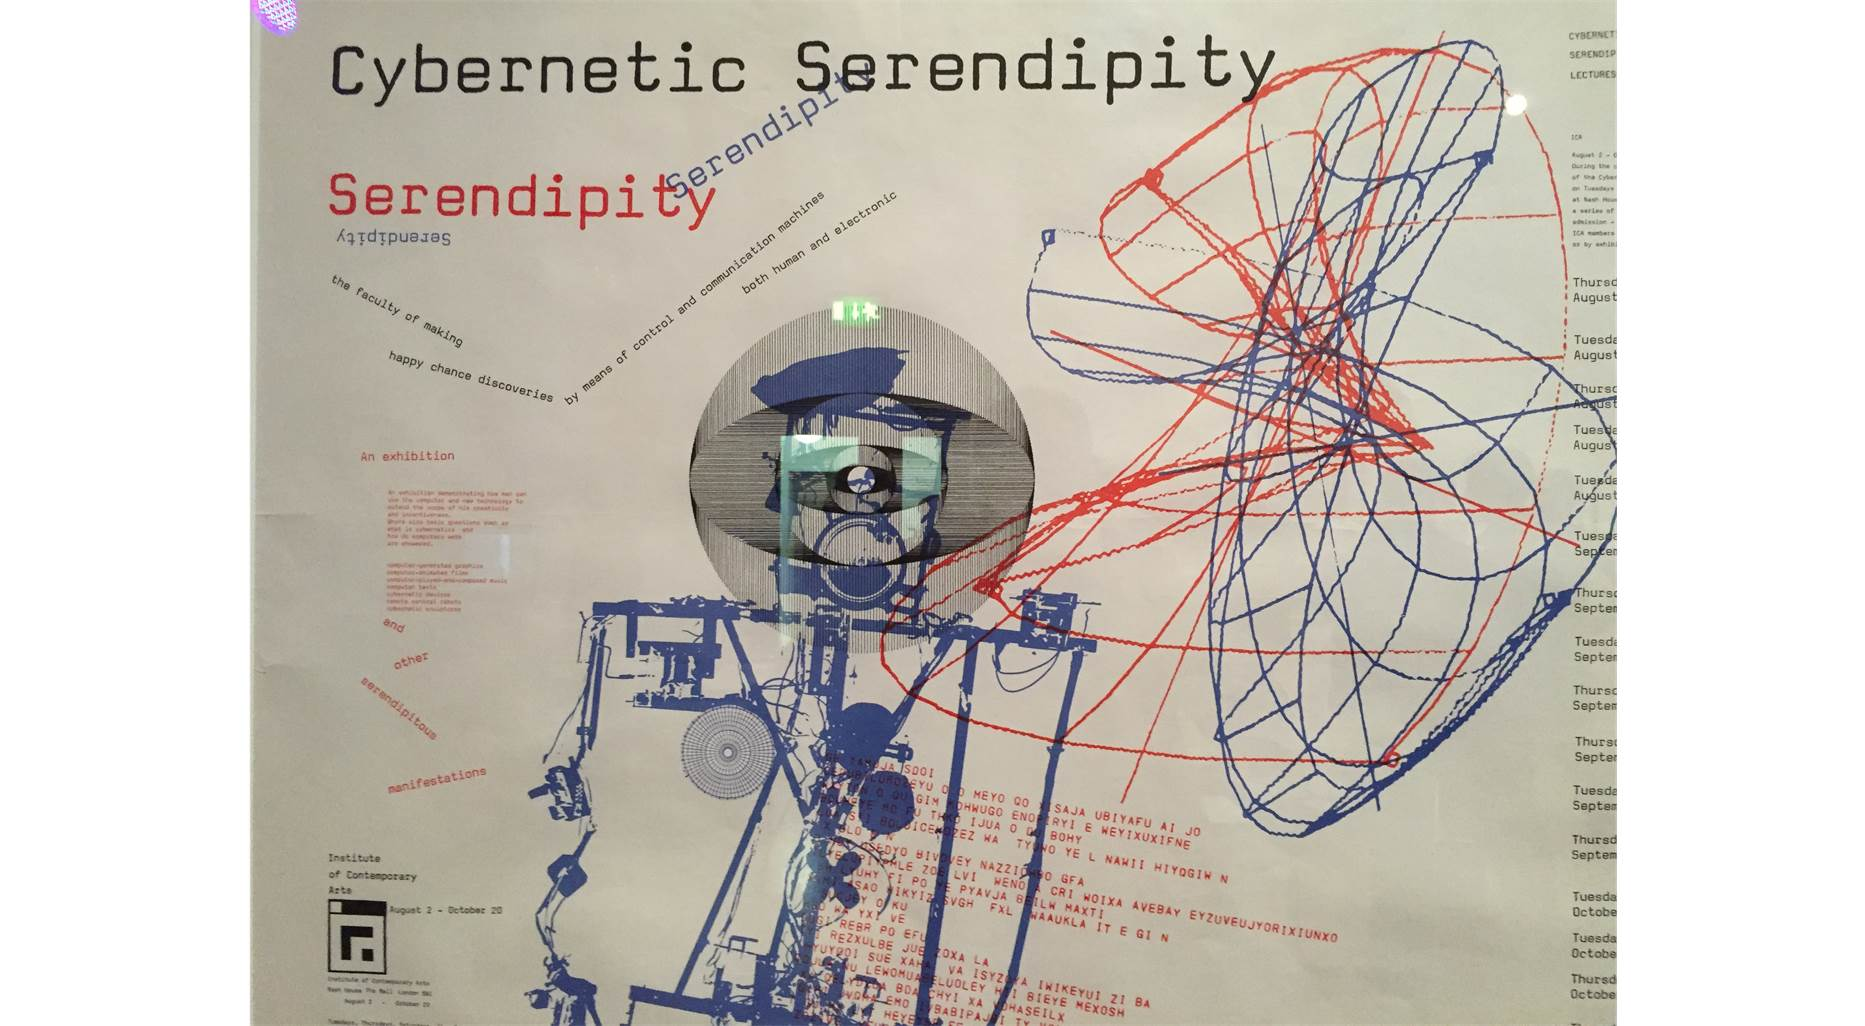 Cybernetic serendibity